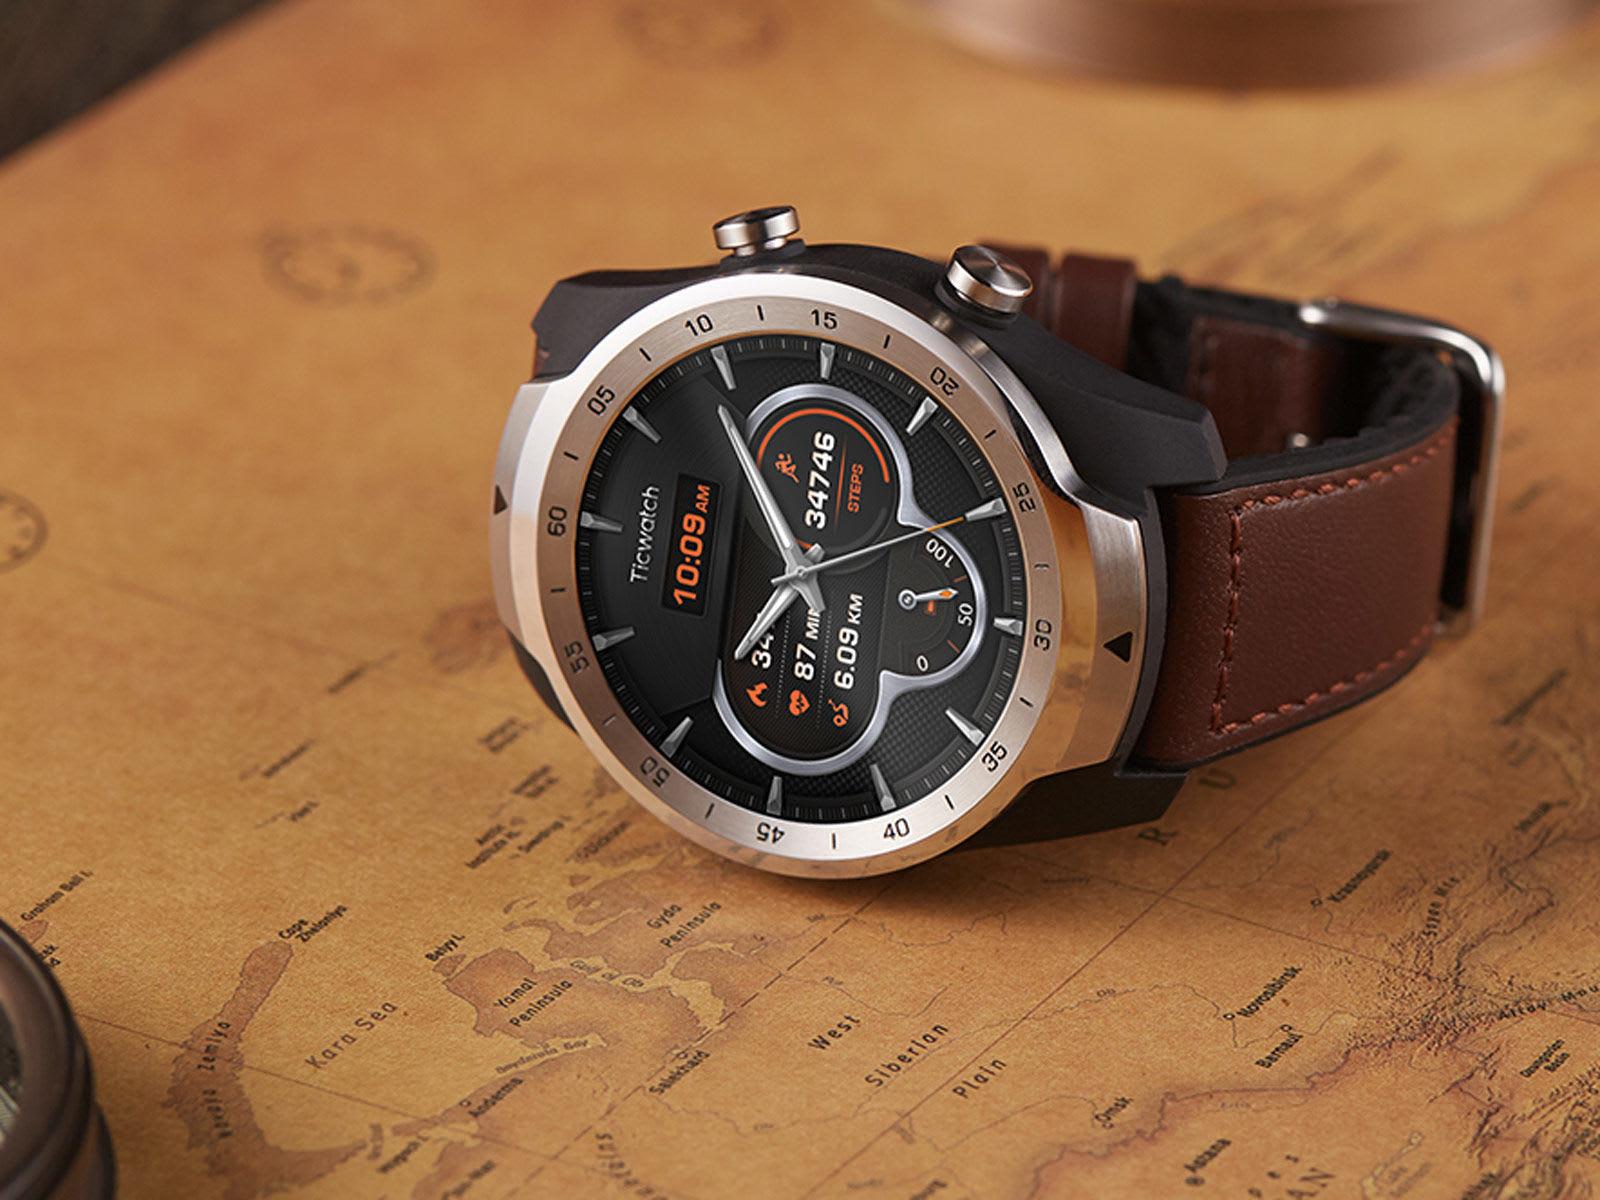 Movboi Ram倍増のスマートウォッチ Ticwatch Pro を海外発表 Engadget 日本版